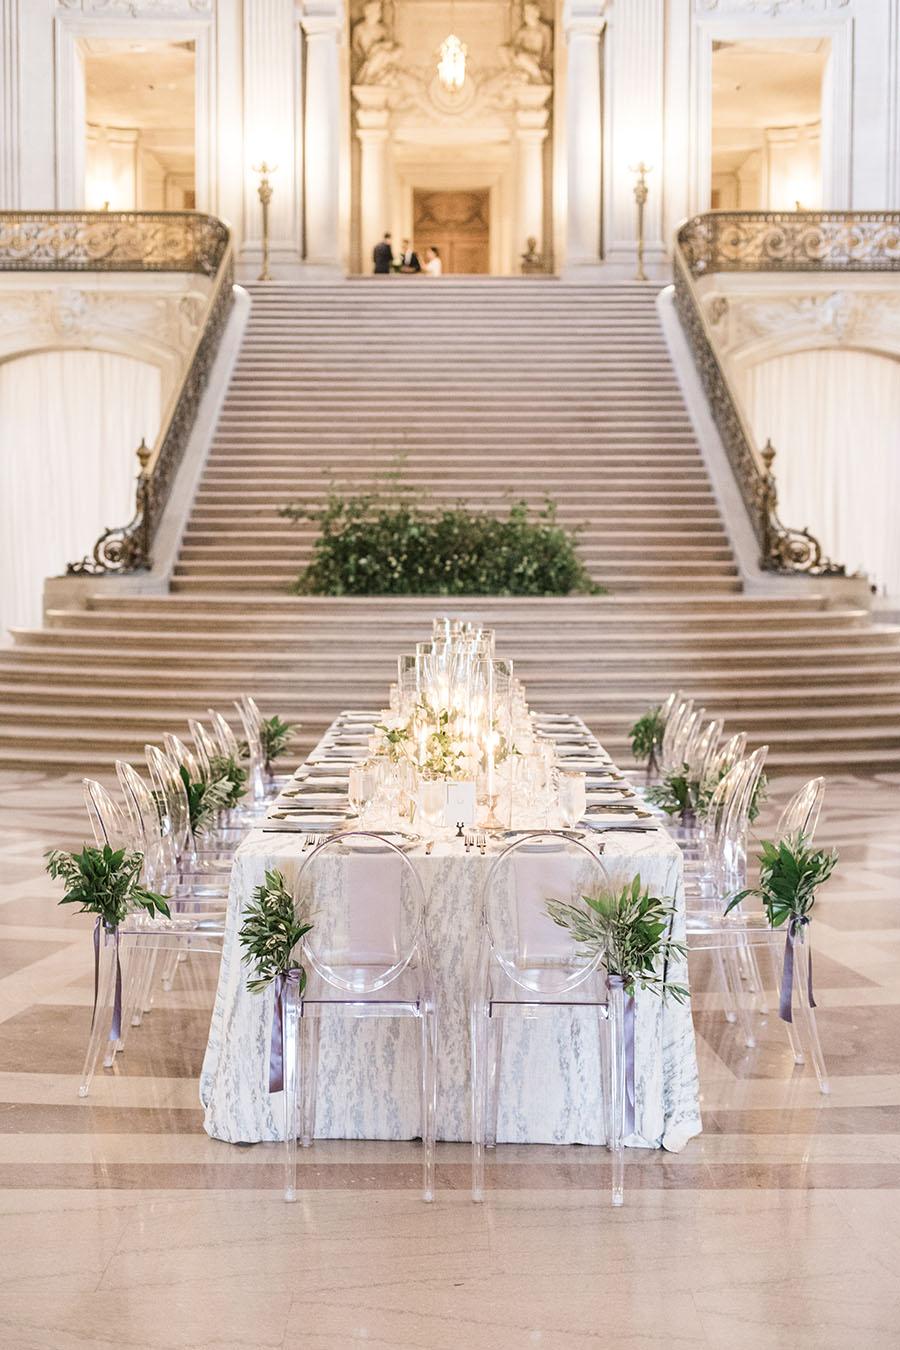 San Francisco City Hall wedding Nicole Blumberg Photography (465 of 842).jpg